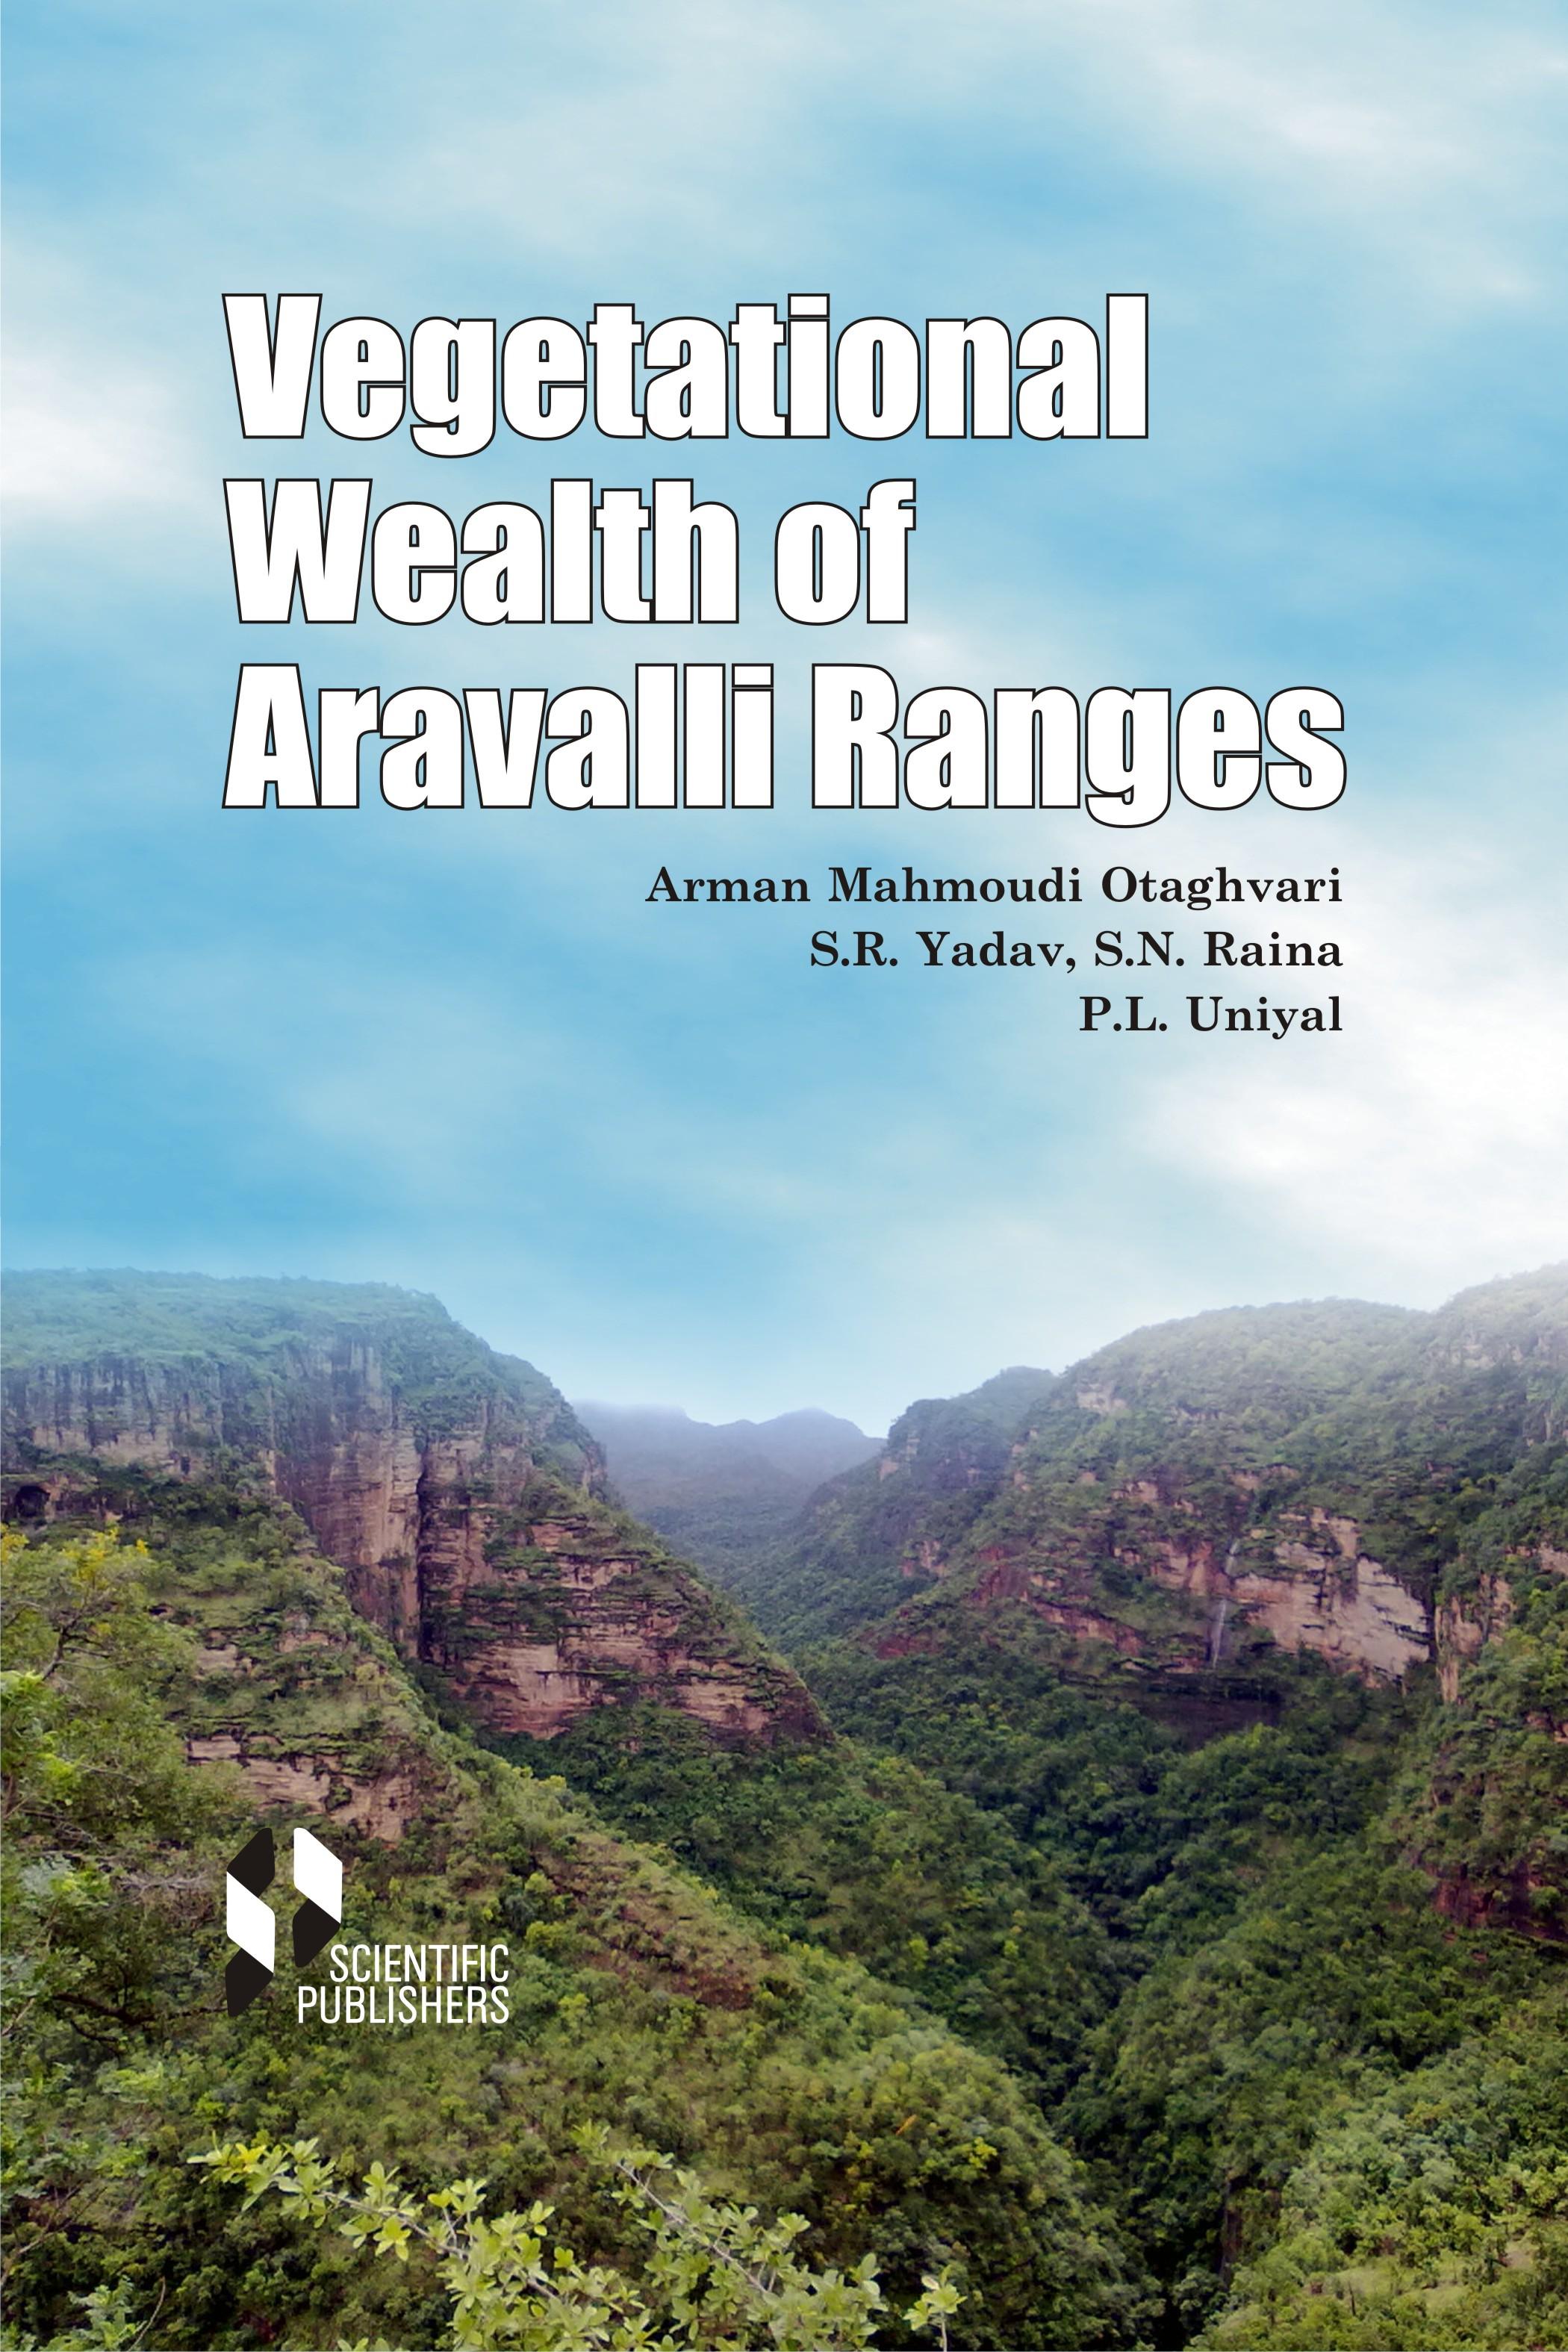 Vegetational Wealth of Aravalli Ranges